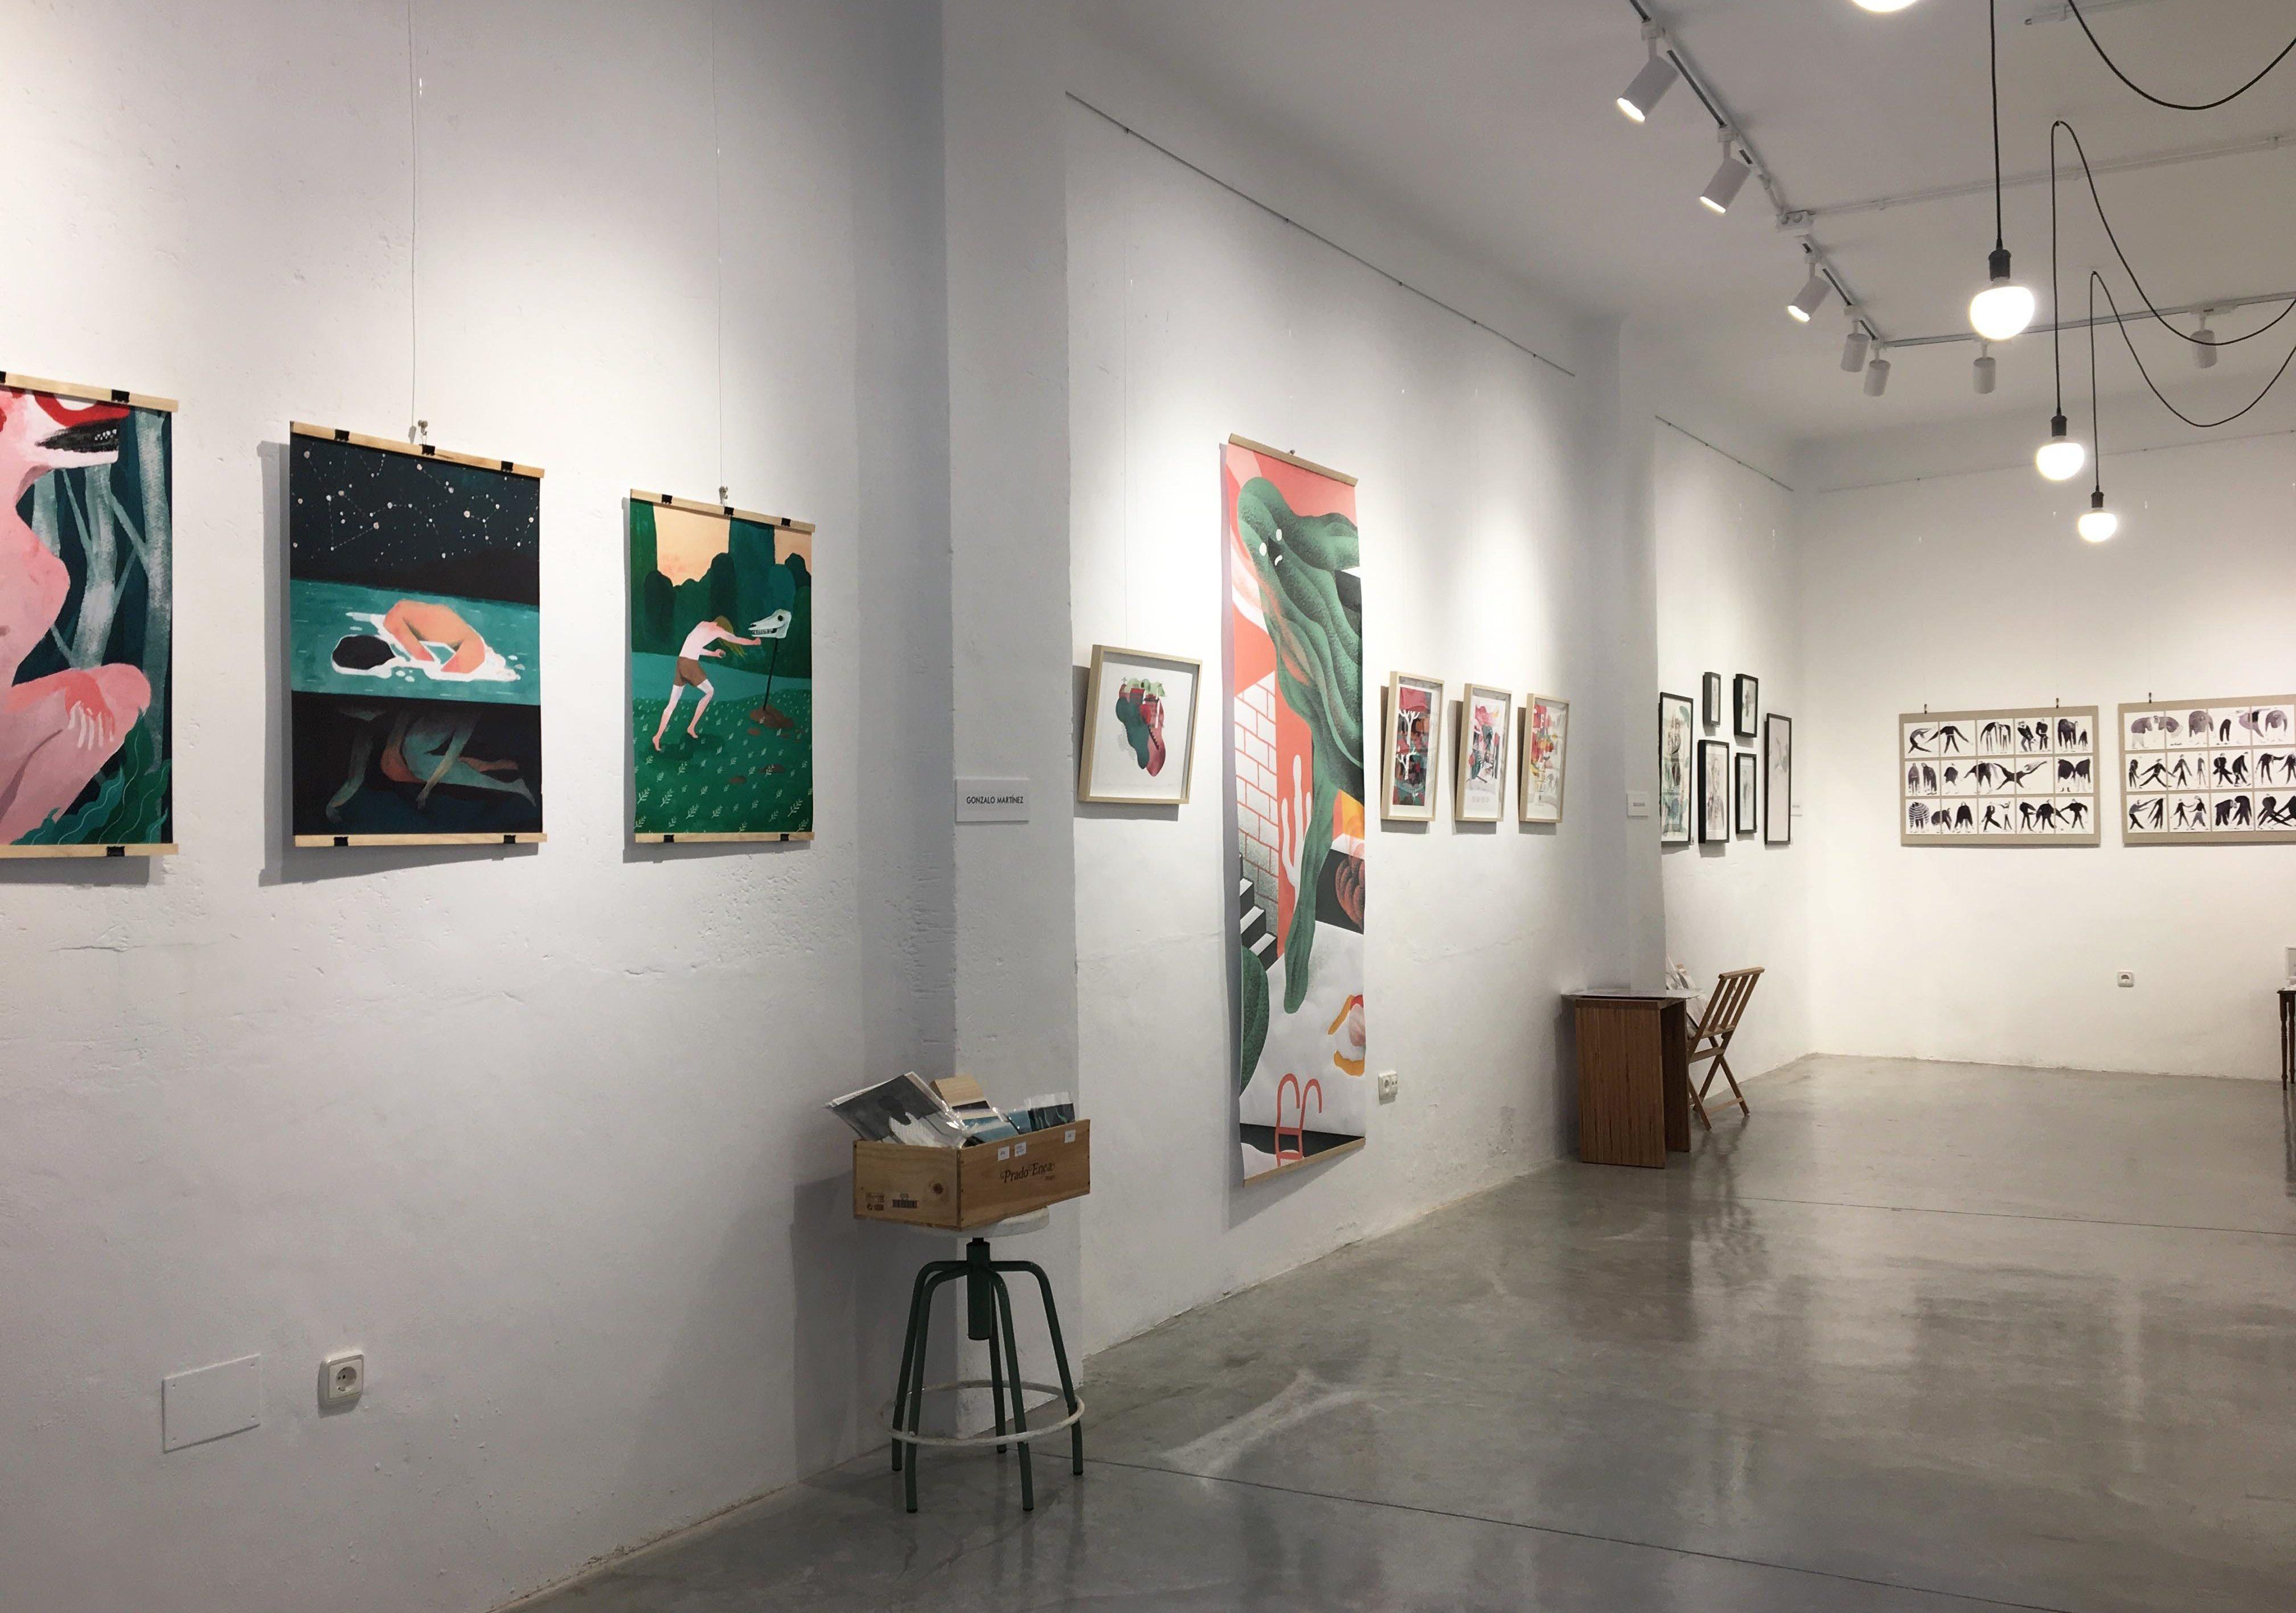 Exposición Colectiva Ilustración. Arquitectura de Barrio. Murcia